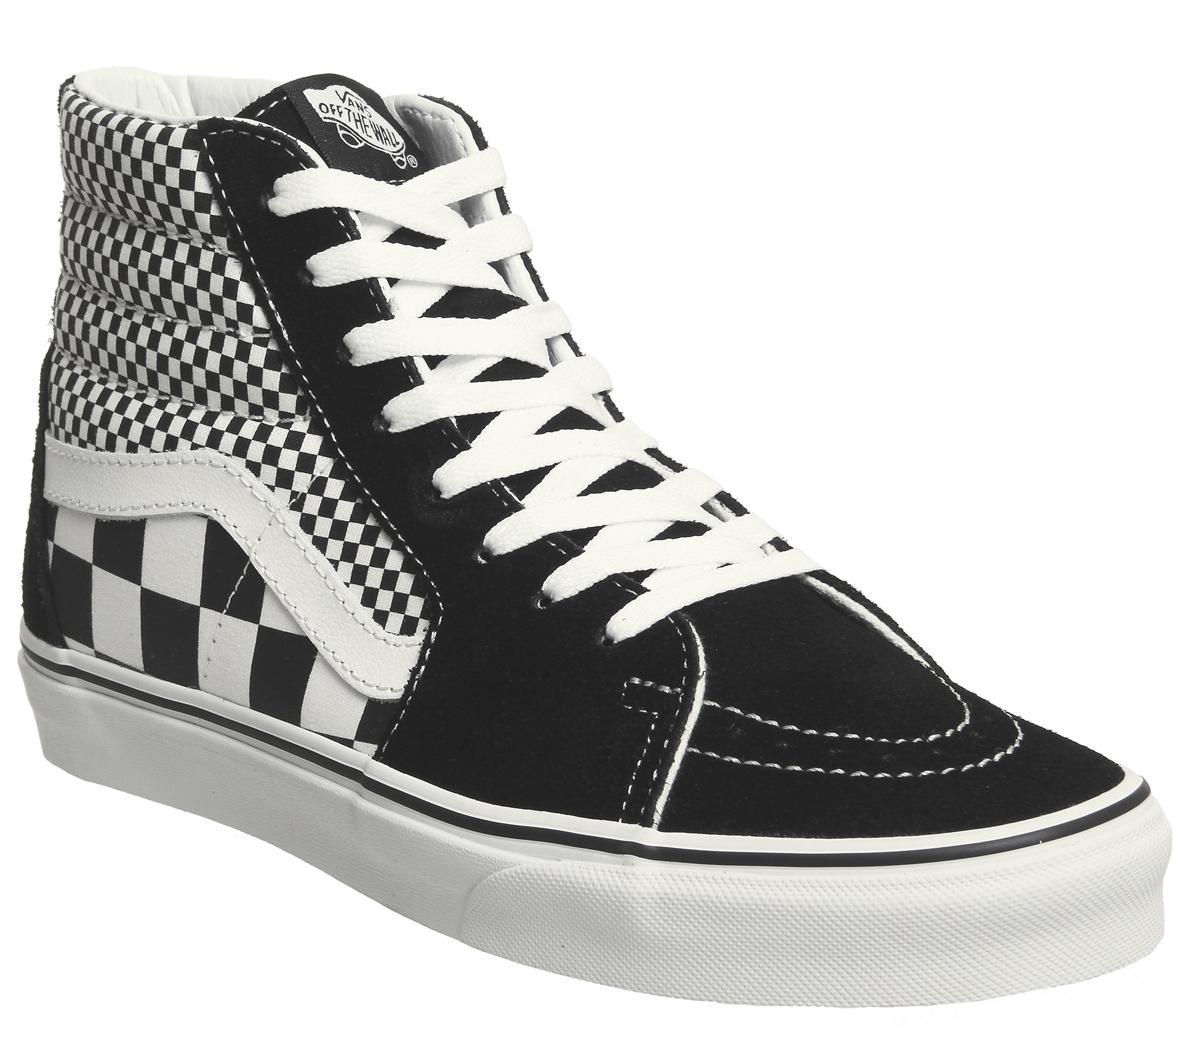 Vans Sk8 Hi Trainers Black White Mix